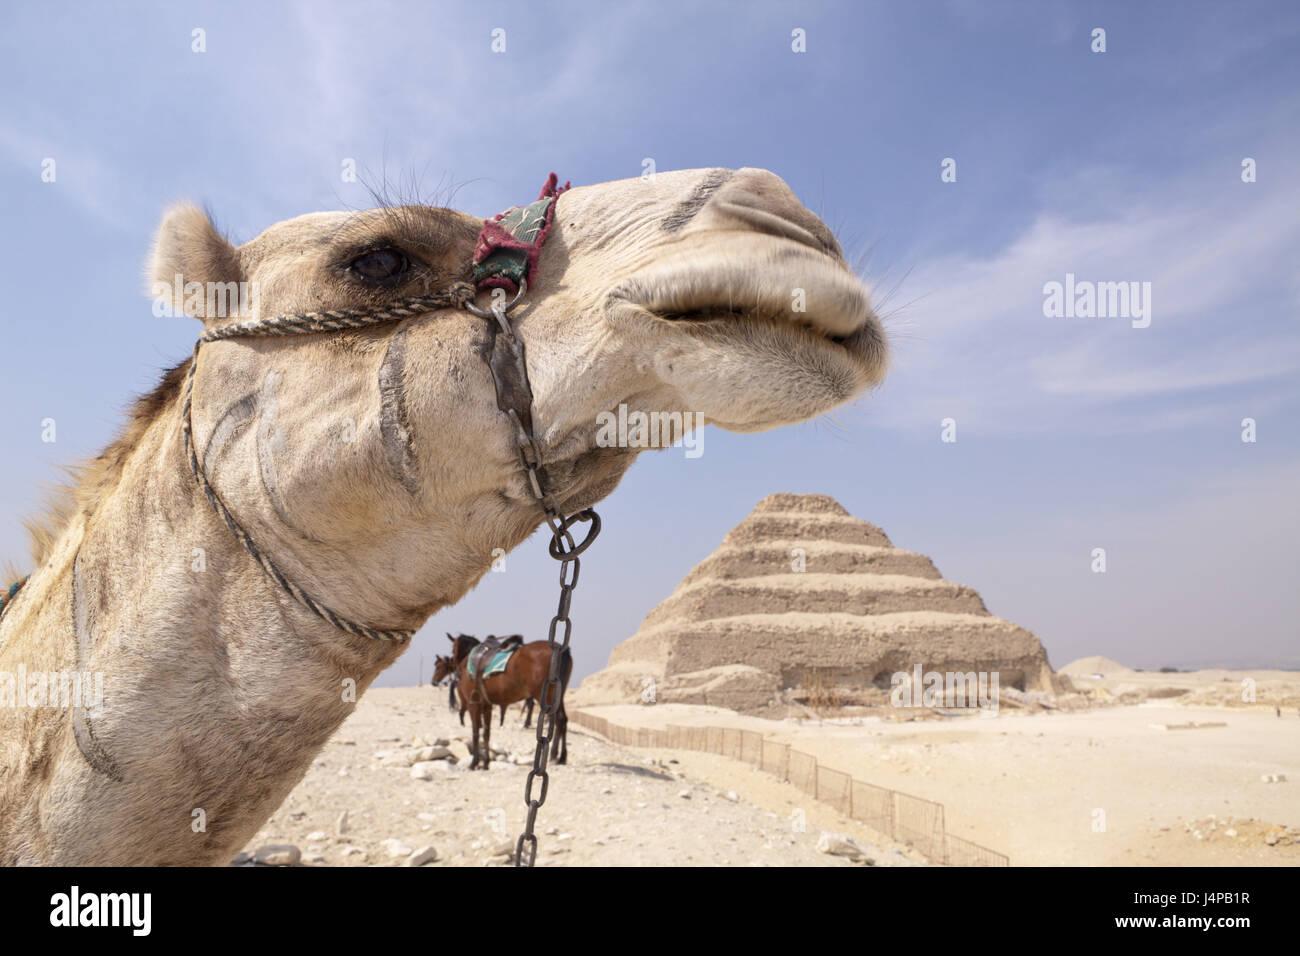 Il cammello, passo piramide Sakkara del faraone Djoser, Egitto, Sakkara, Immagini Stock